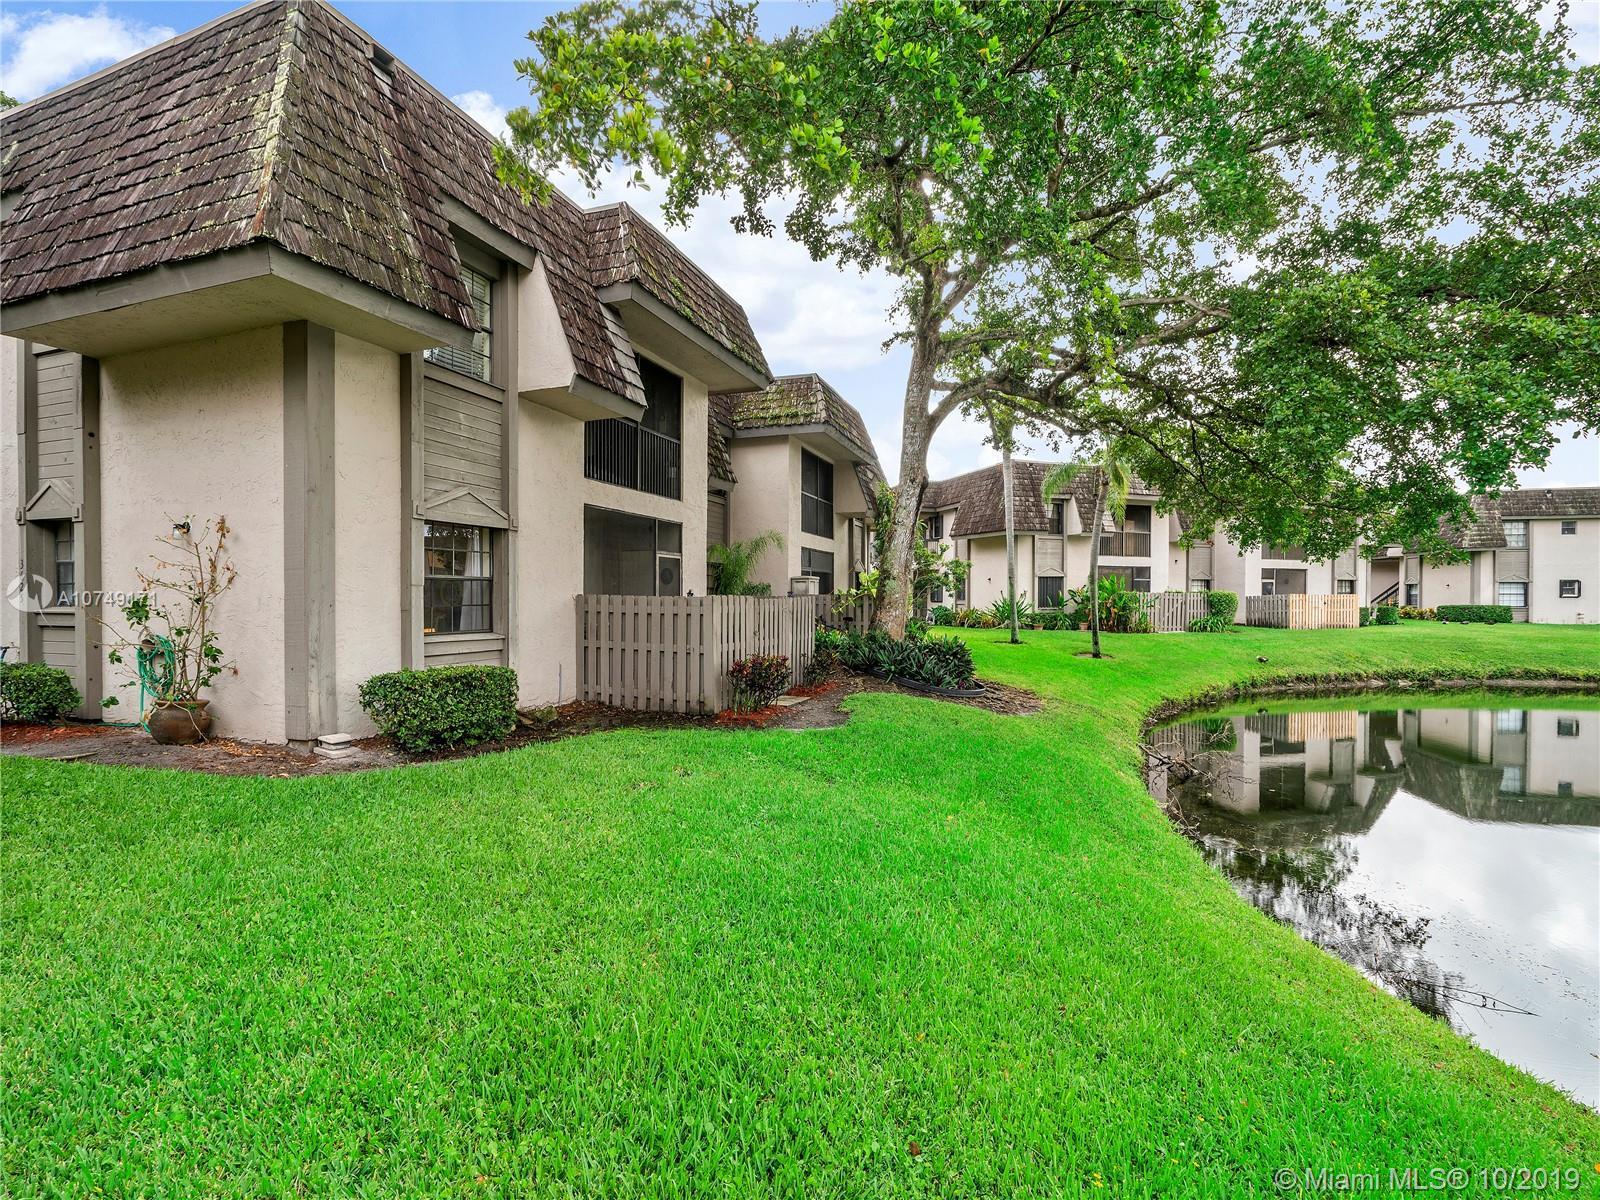 Property for sale at 3625 NW 94th Ave # 3G, Sunrise FL 33351 Unit 3G, Sunrise,  Florida 33351